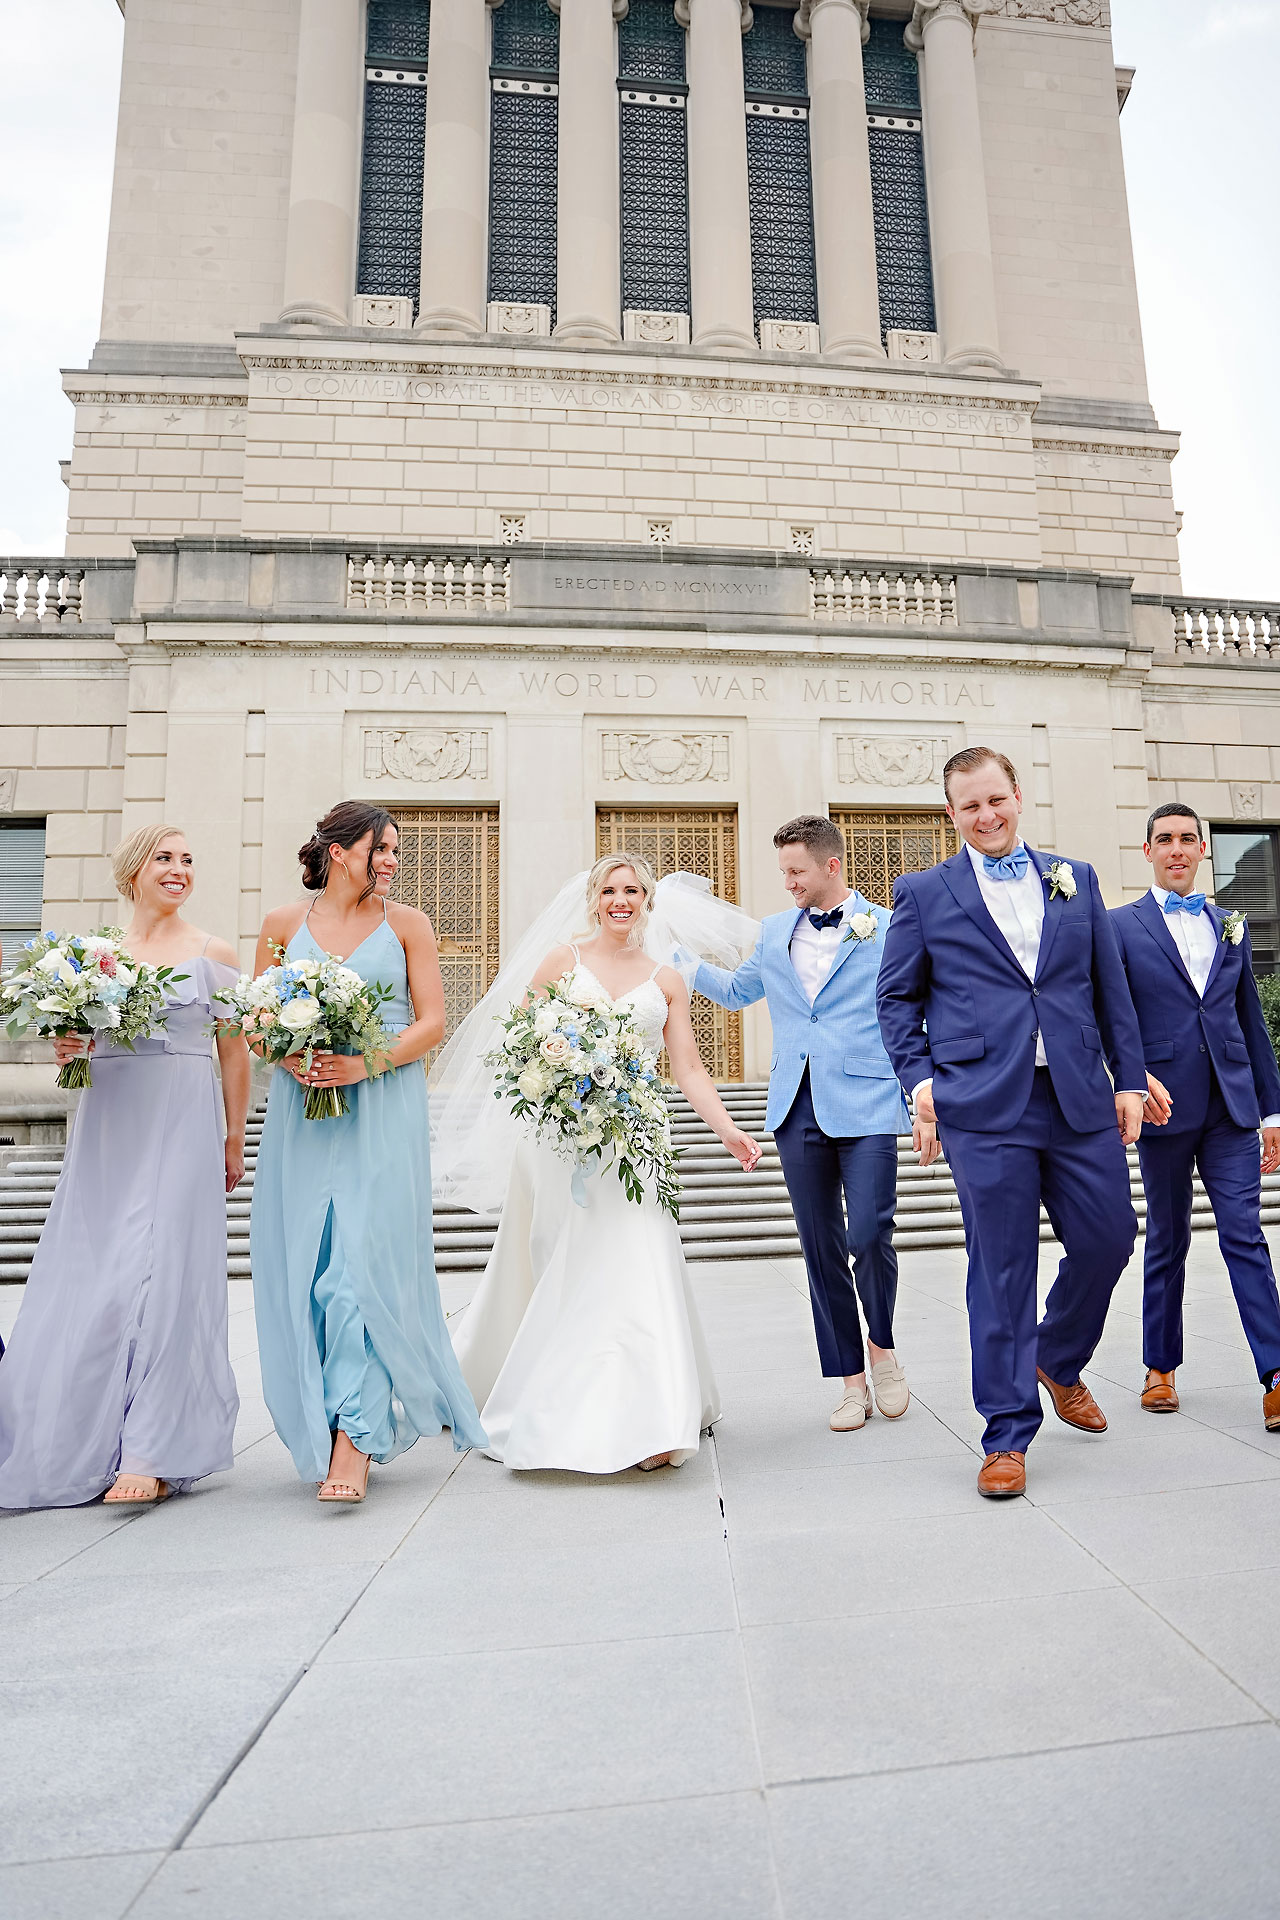 Sammi Jack Regions Tower JPS Events Indianapolis Wedding 102